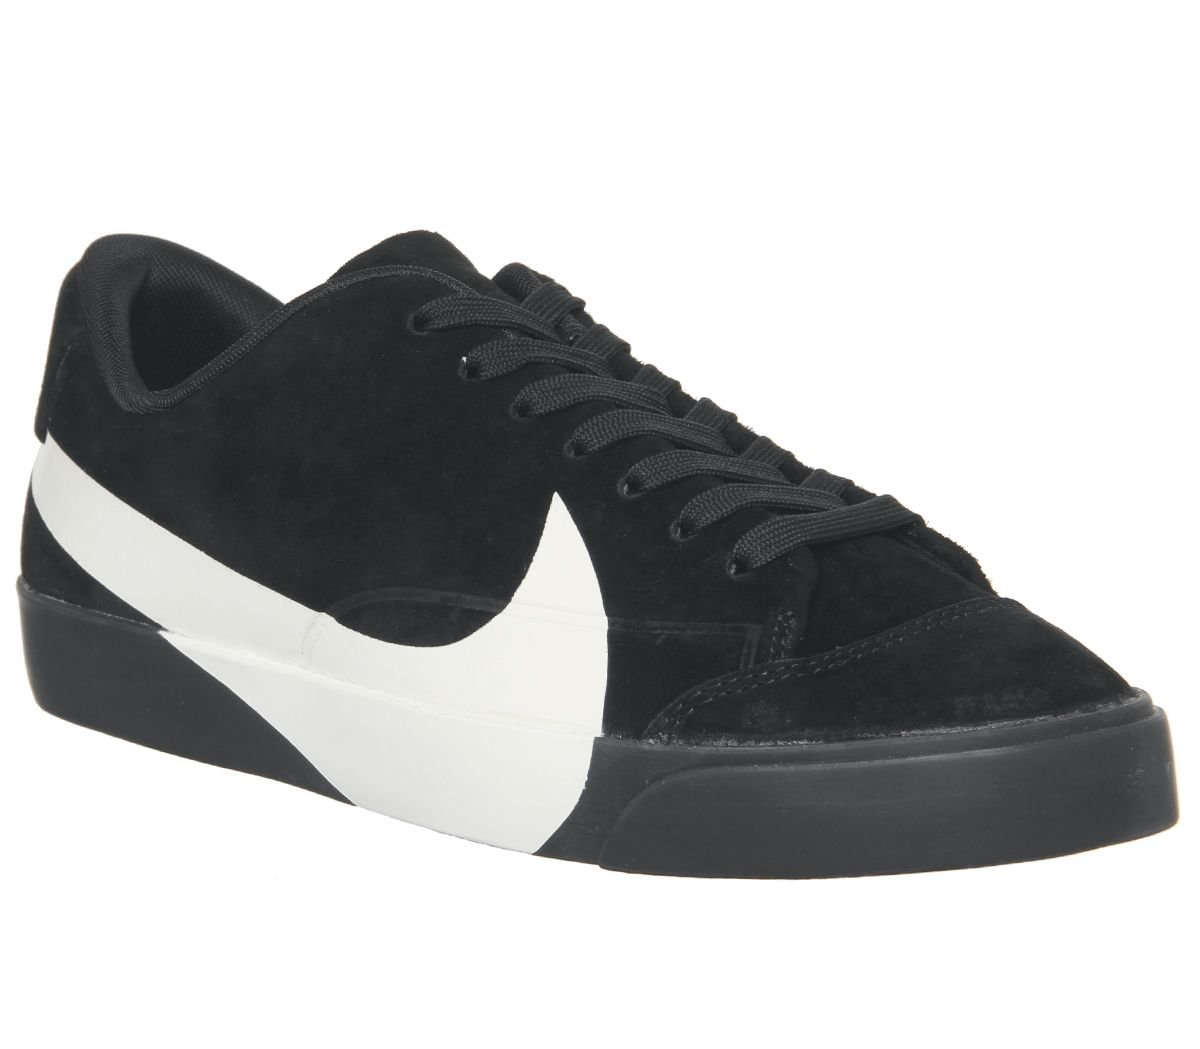 e67dd3e465b1 Nike Blazer City Low Trainers Black White - Hers trainers